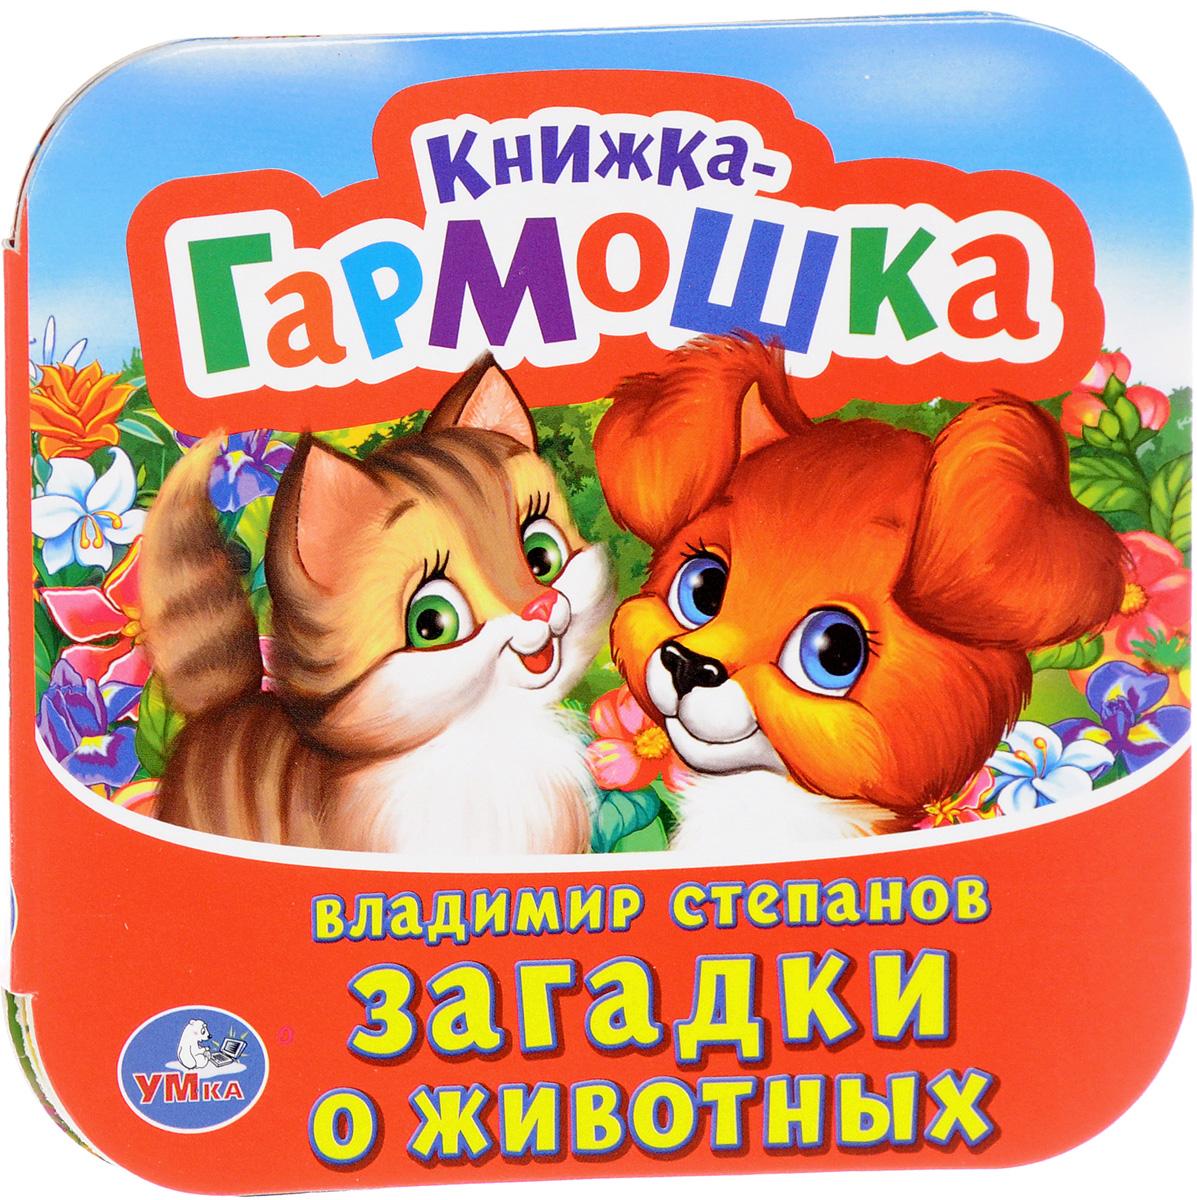 Владимир Степанов Загадки о животных владимир степанов загадки о животных